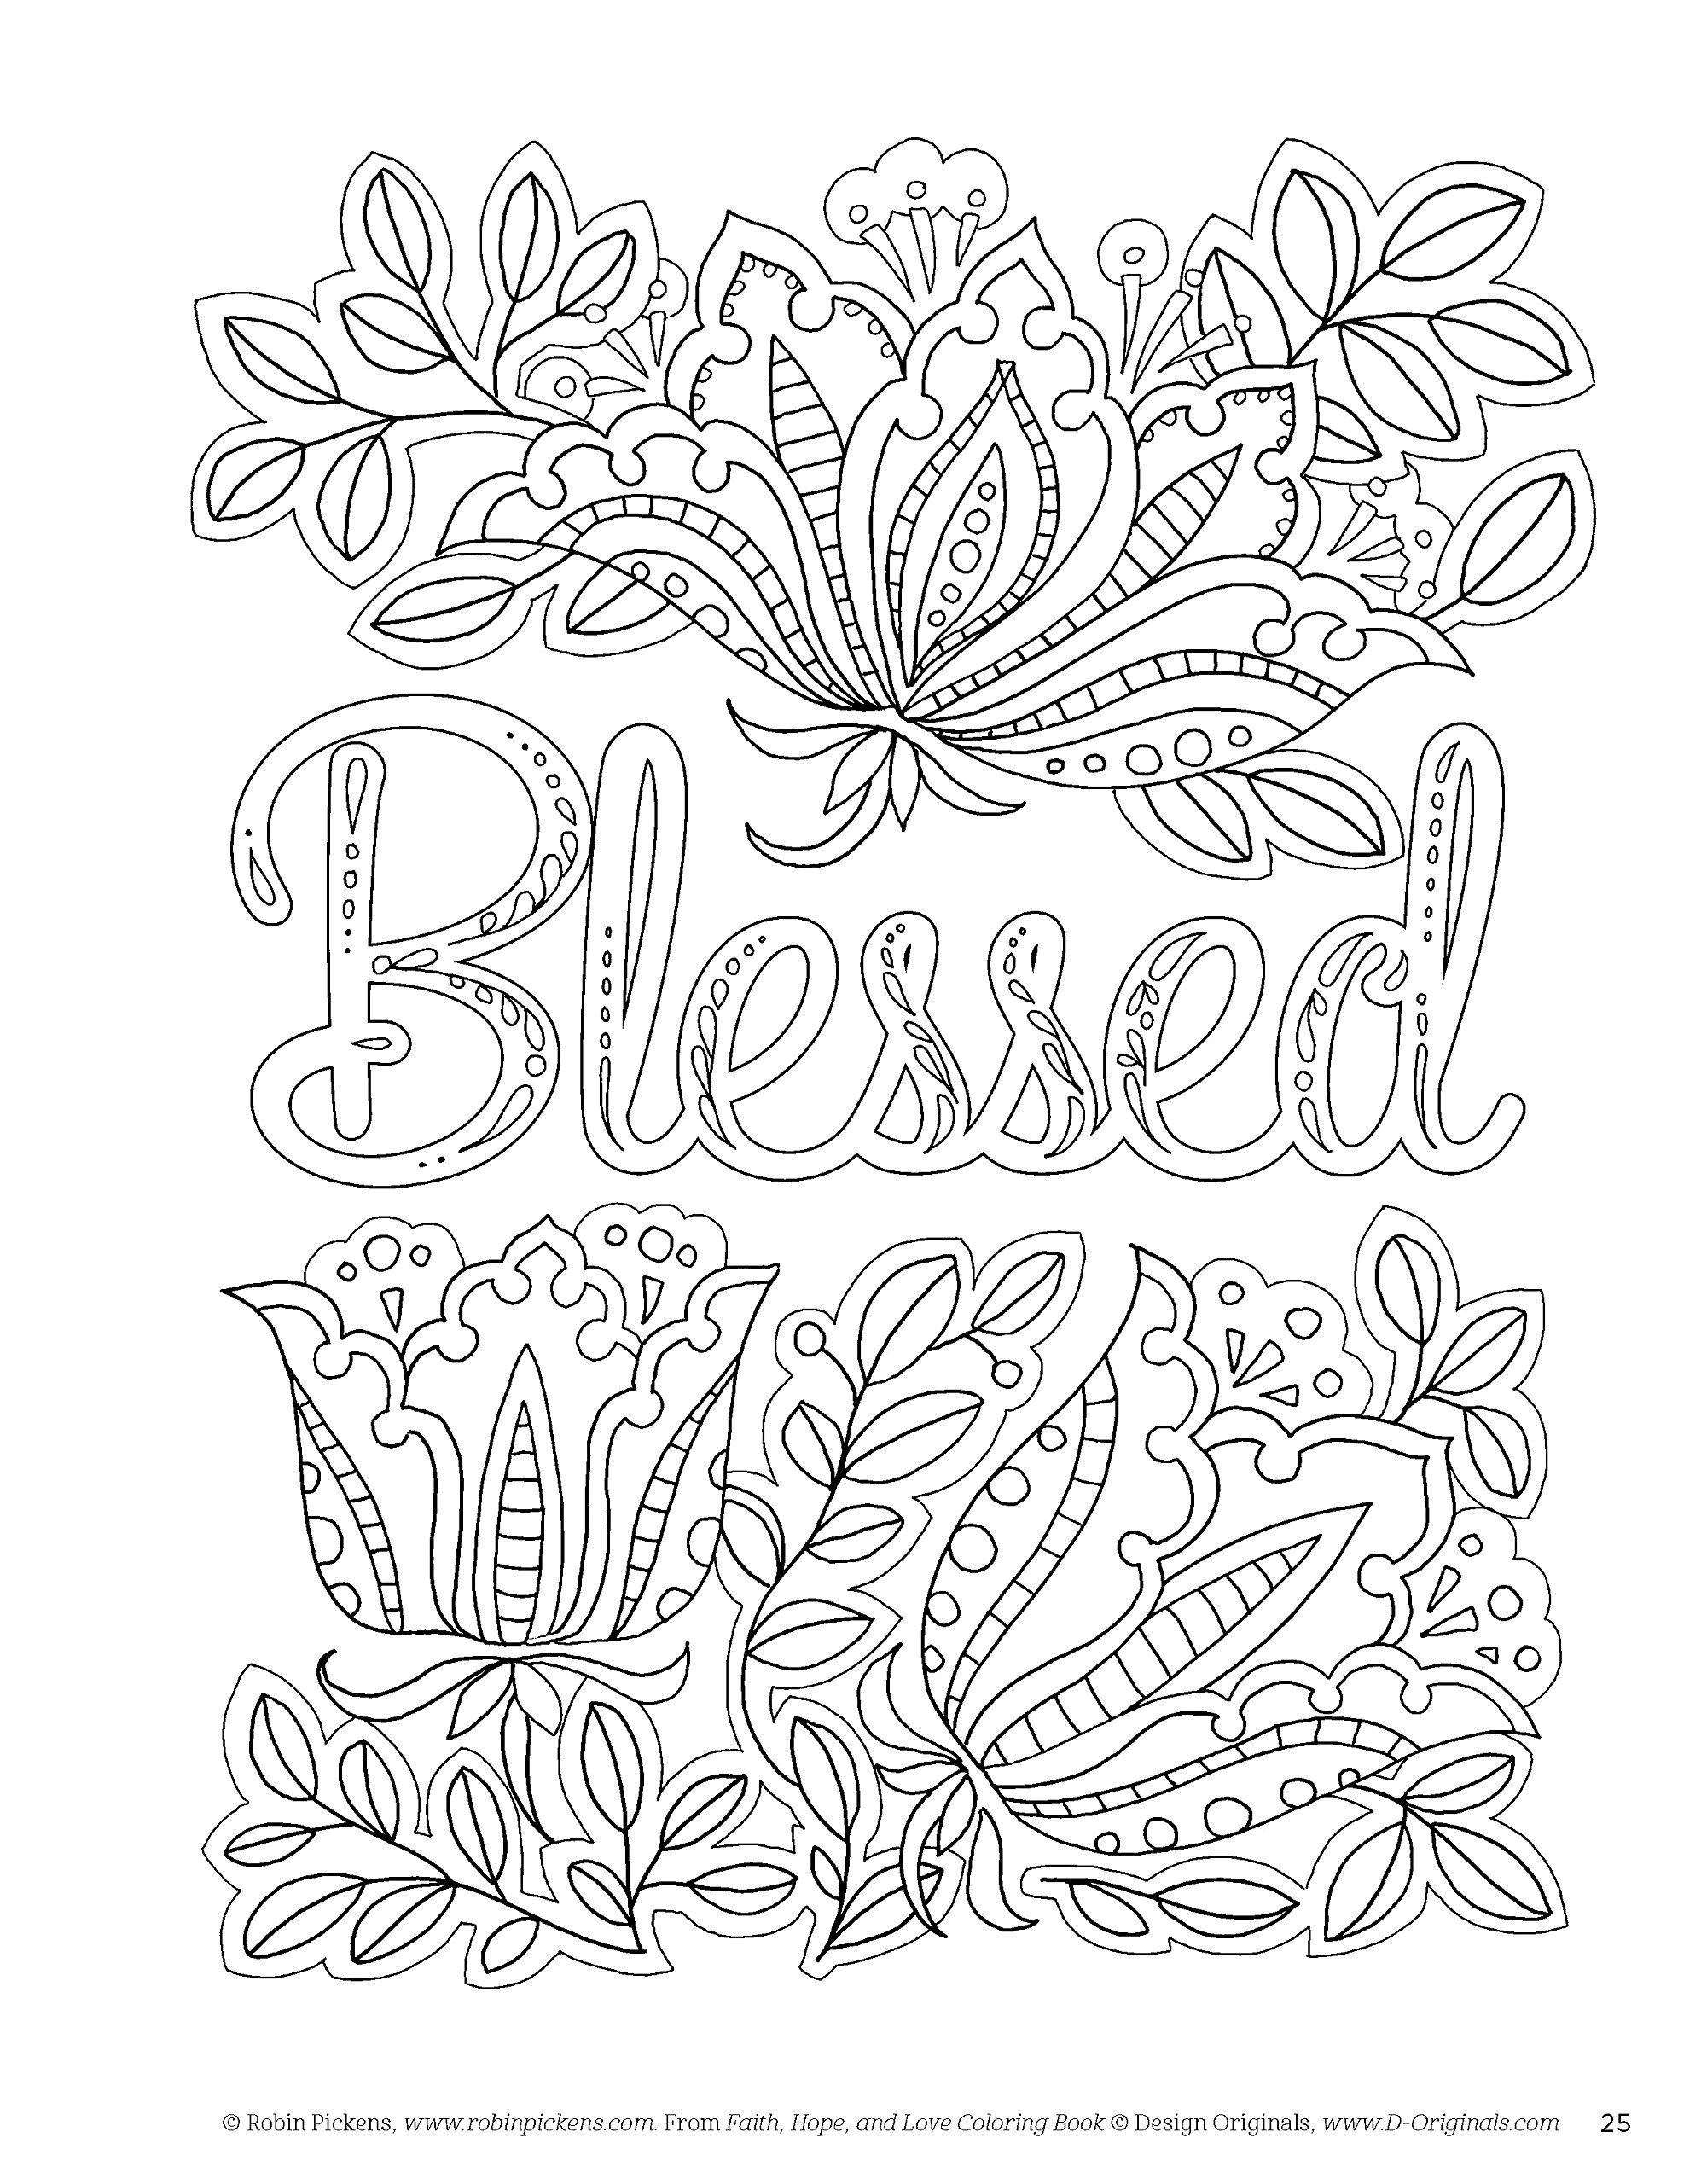 Amazon.com: Faith, Hope, and Love Coloring Book (Creative